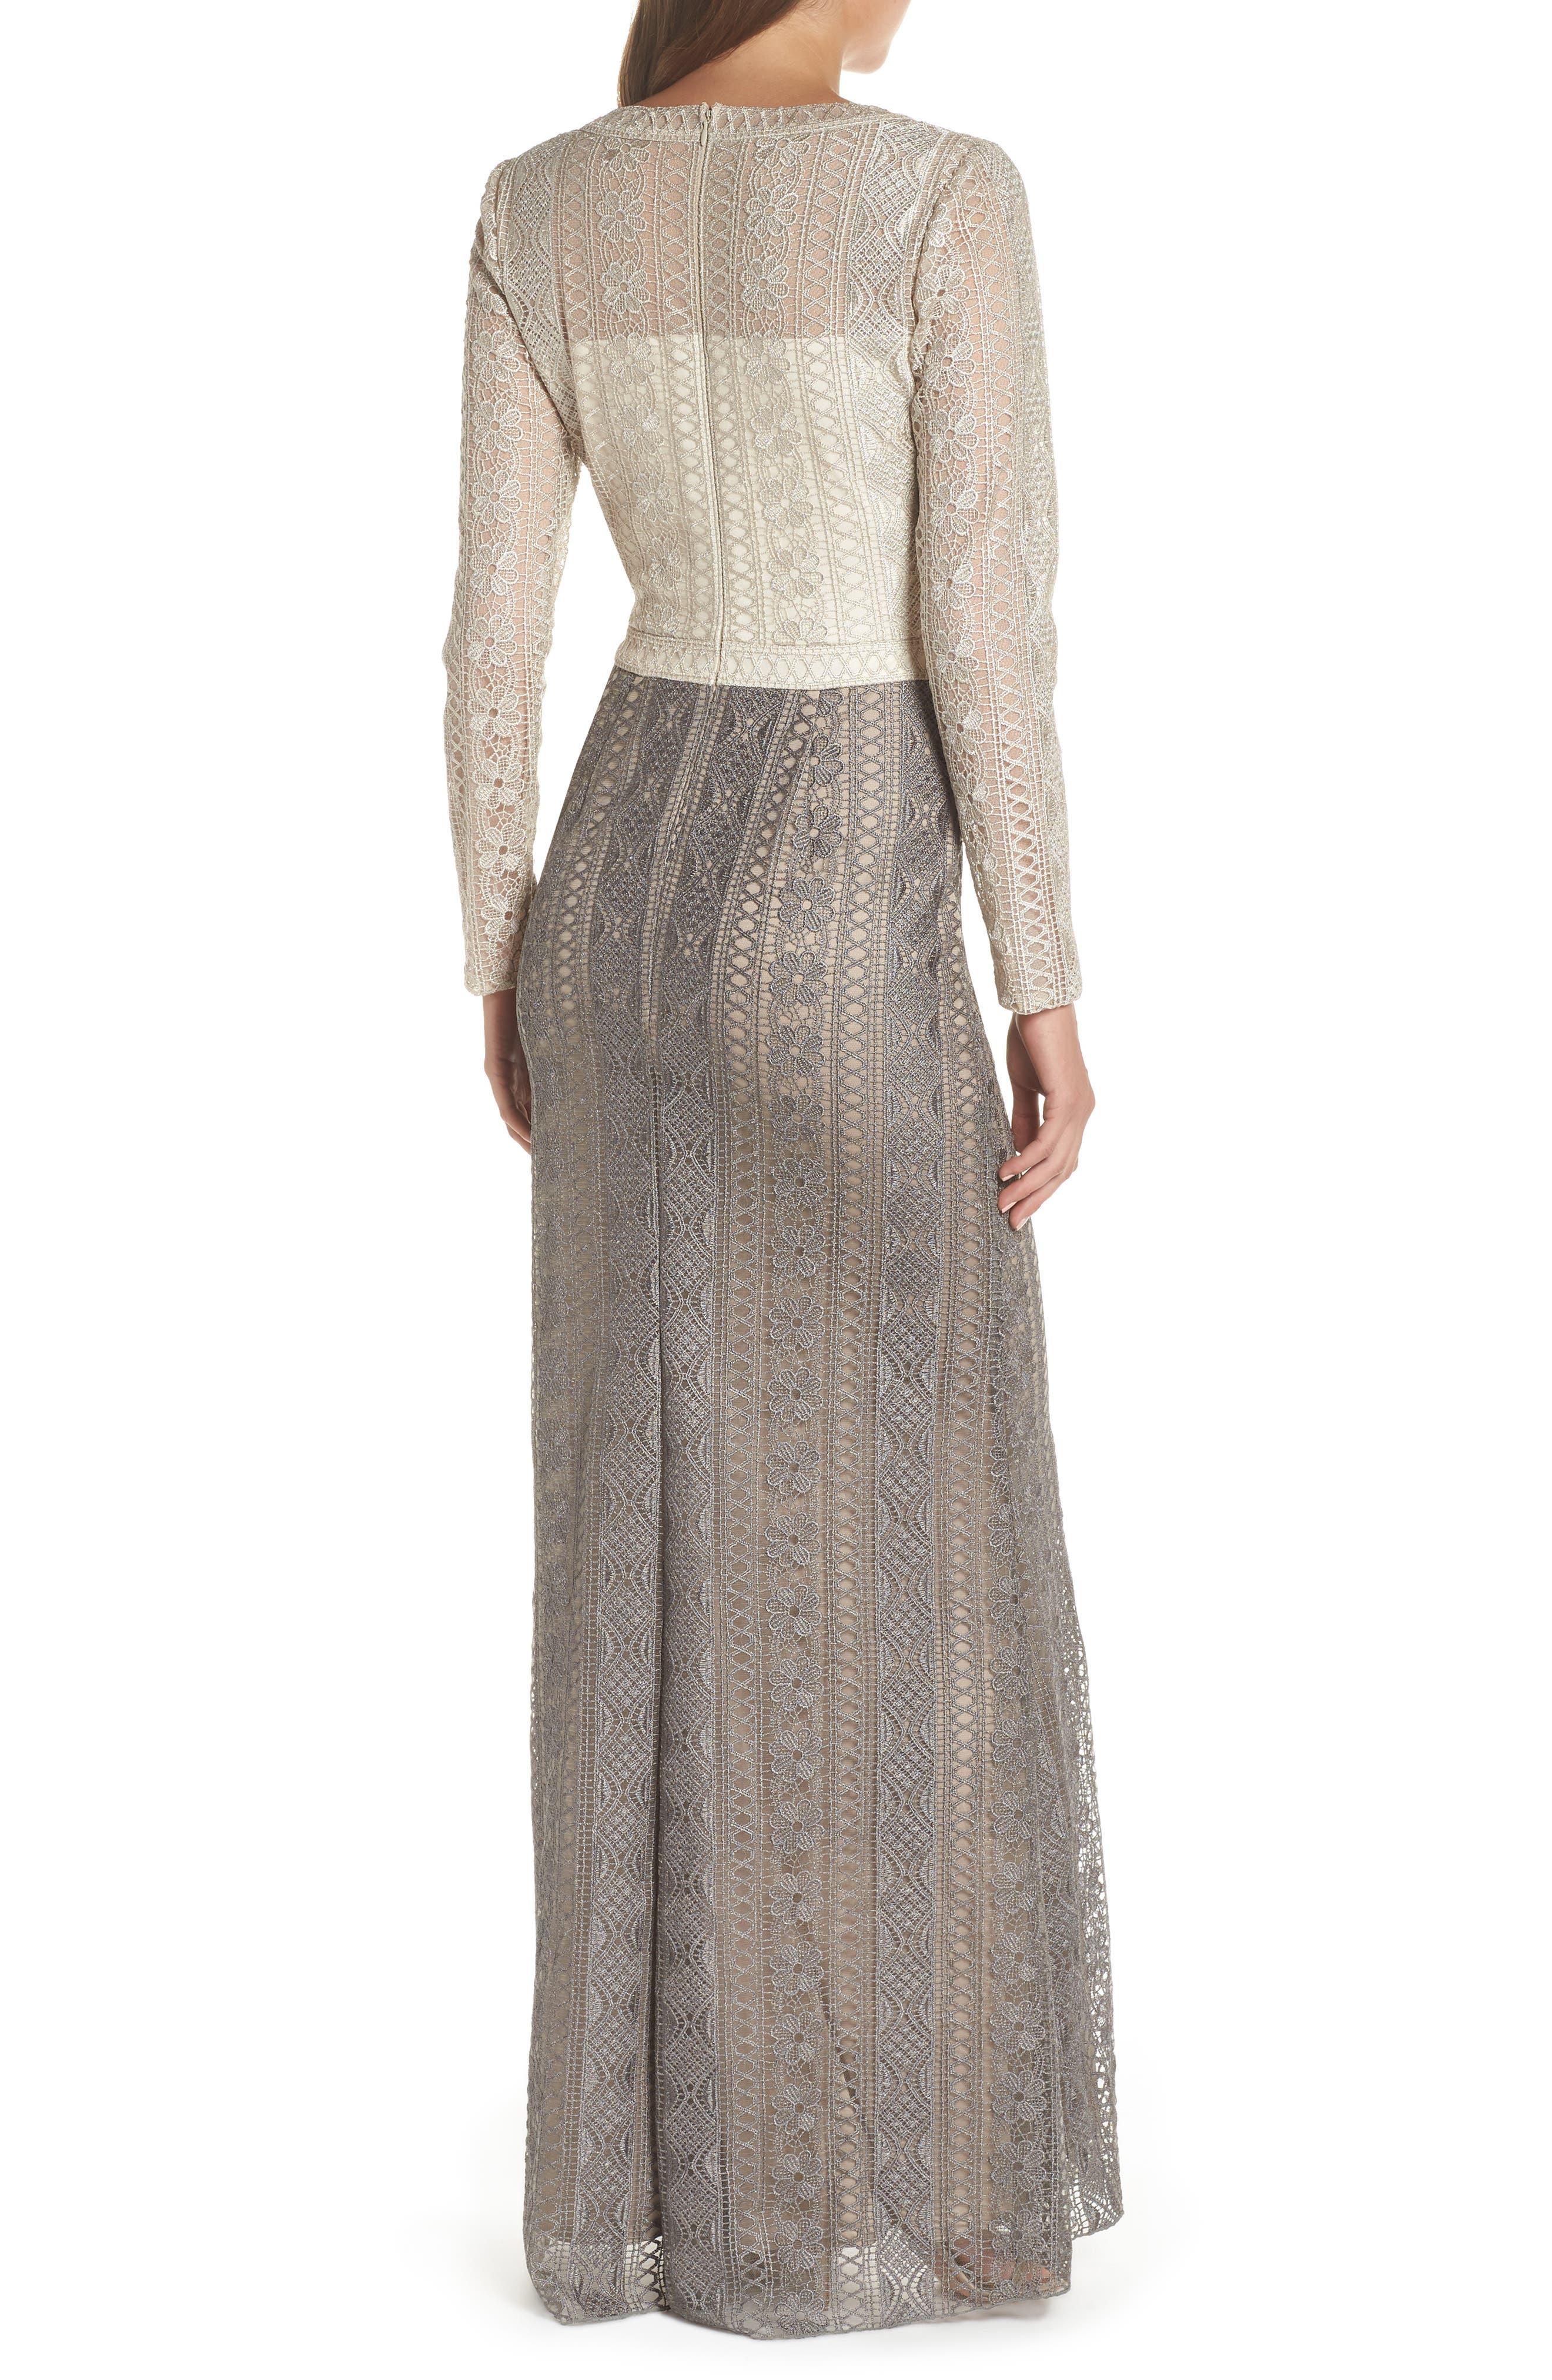 Lace Gown,                             Alternate thumbnail 2, color,                             LATTE/ SMOKE